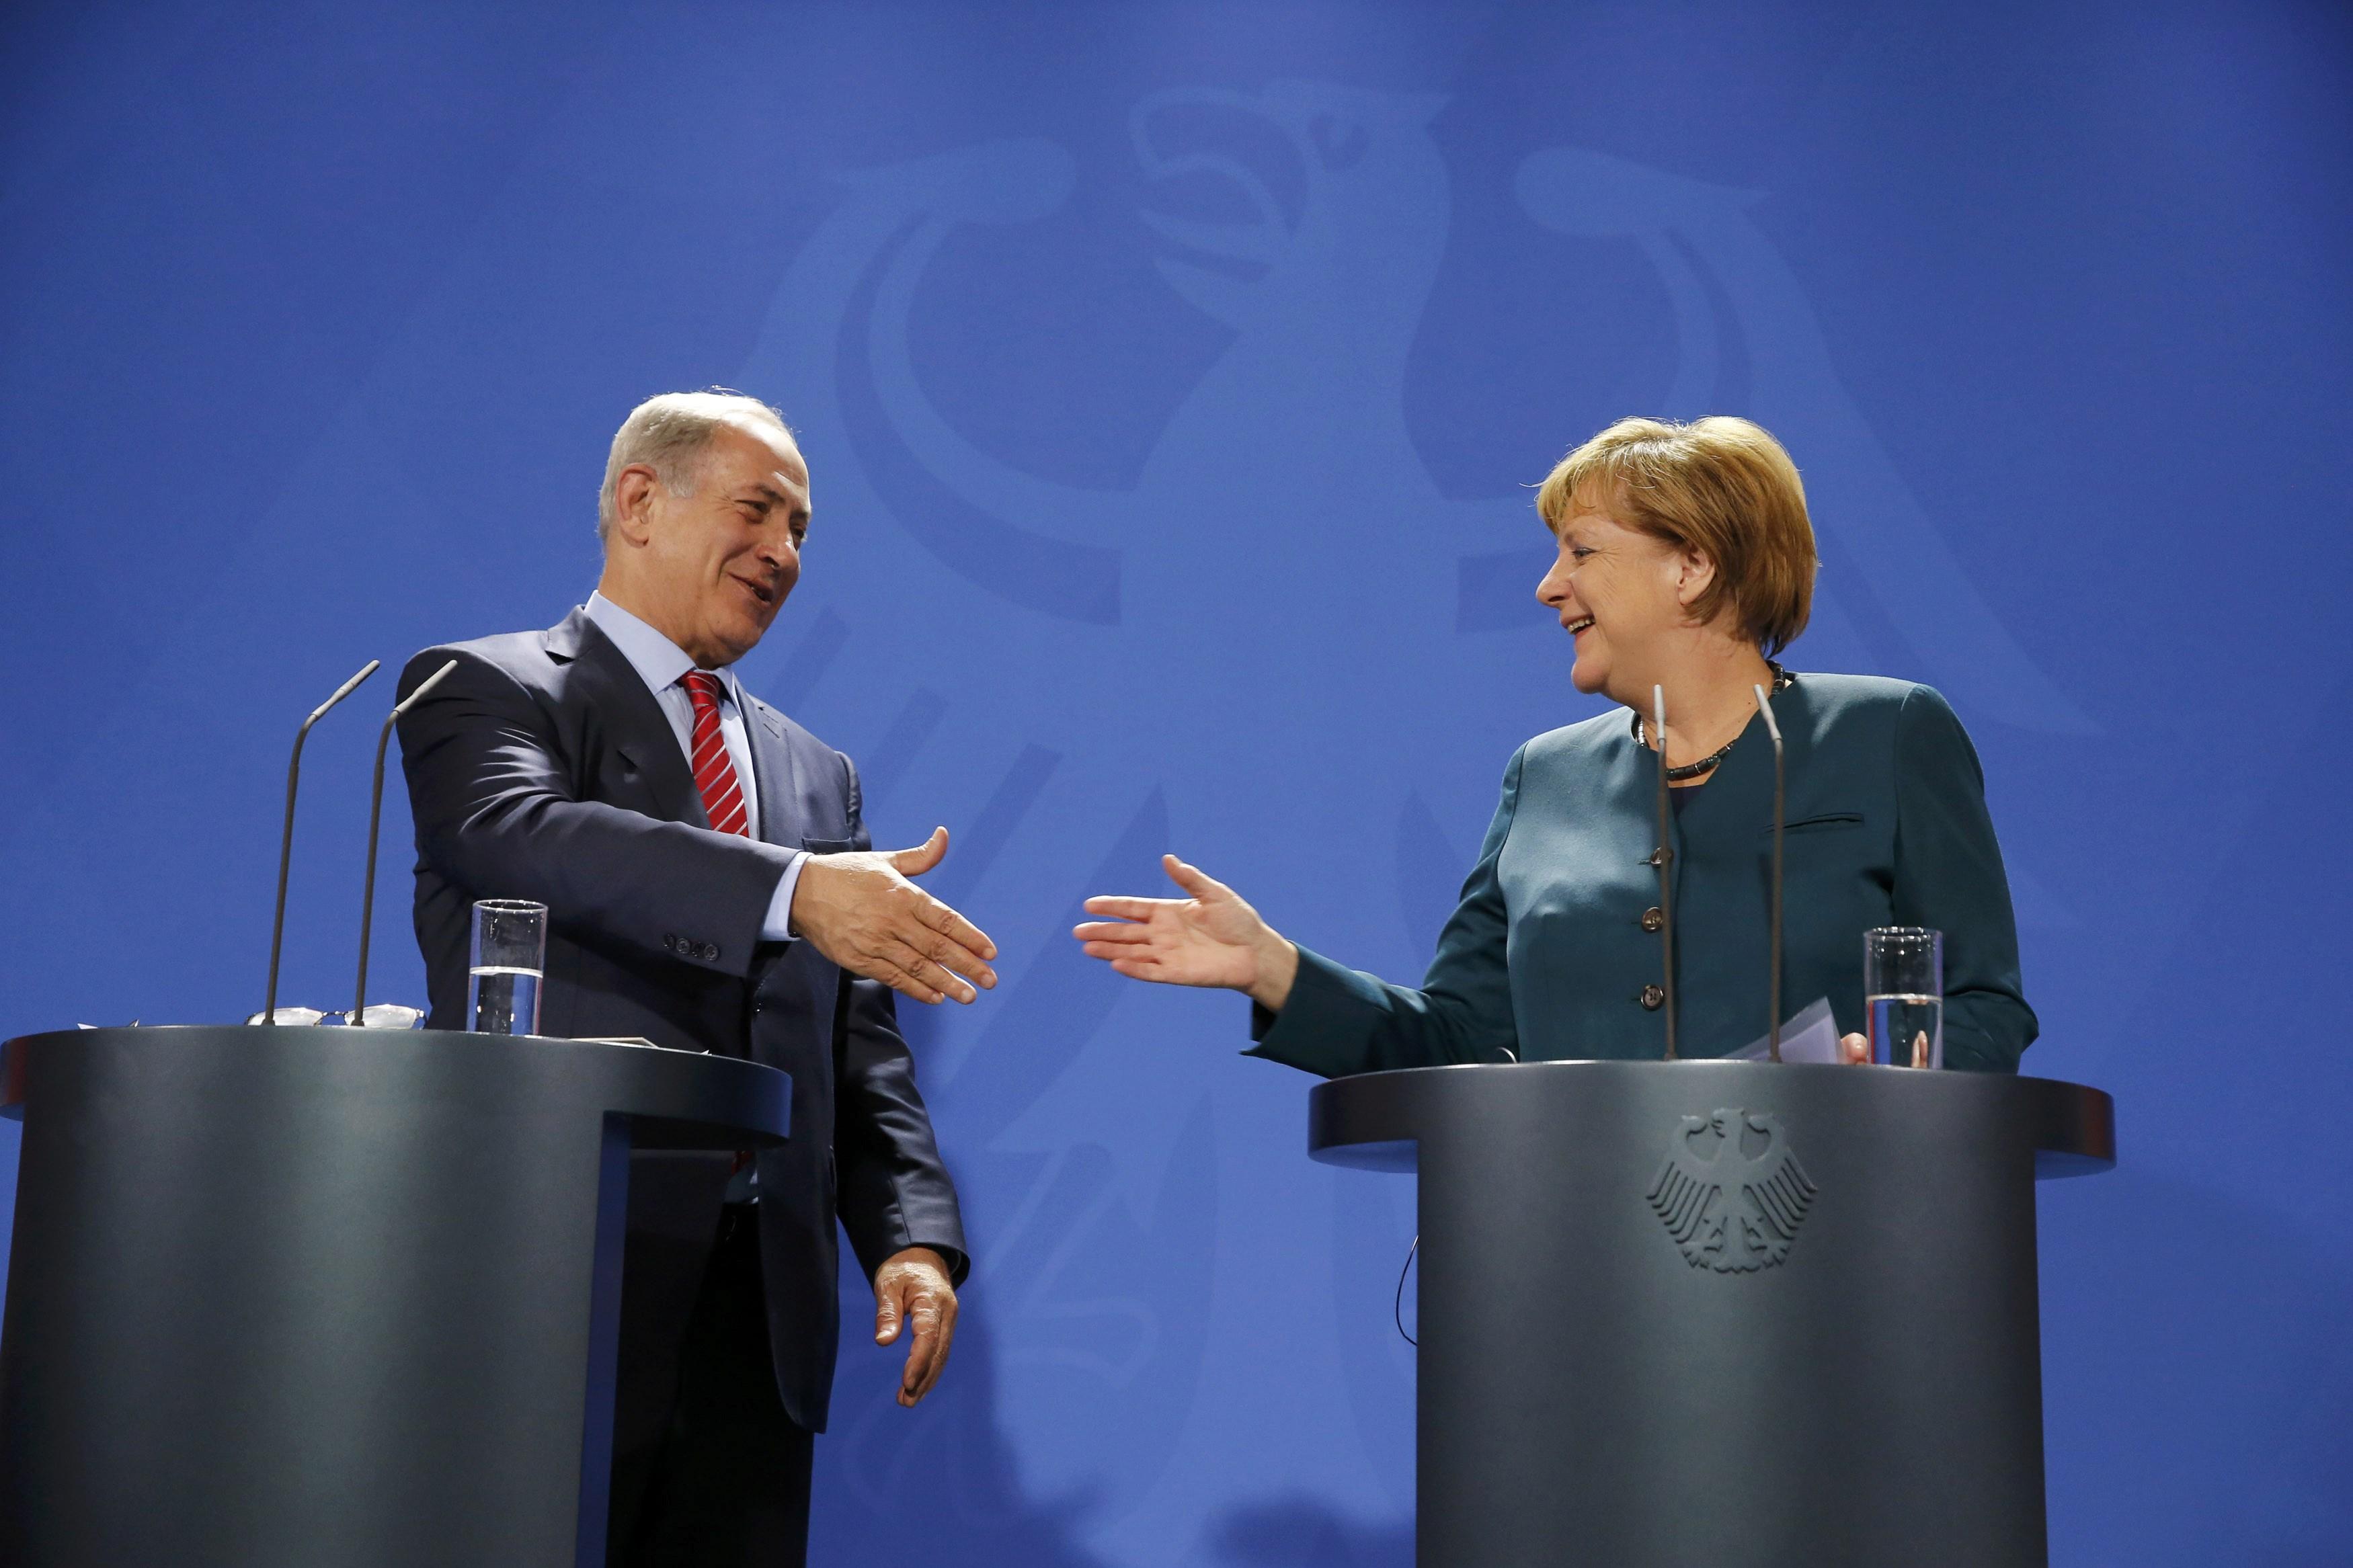 Kanselir Jerman Angela Merkel memberi selamat kepada Perdana Menteri Israel Benyamin Netanyahu pada hari ulang tahunnya saat konferesi bersama di Kantor Kanselir di Berlin, Jerman, Rabu (21/10). ANTARA FOTO/REUTERS/Fabrizio Bensch.